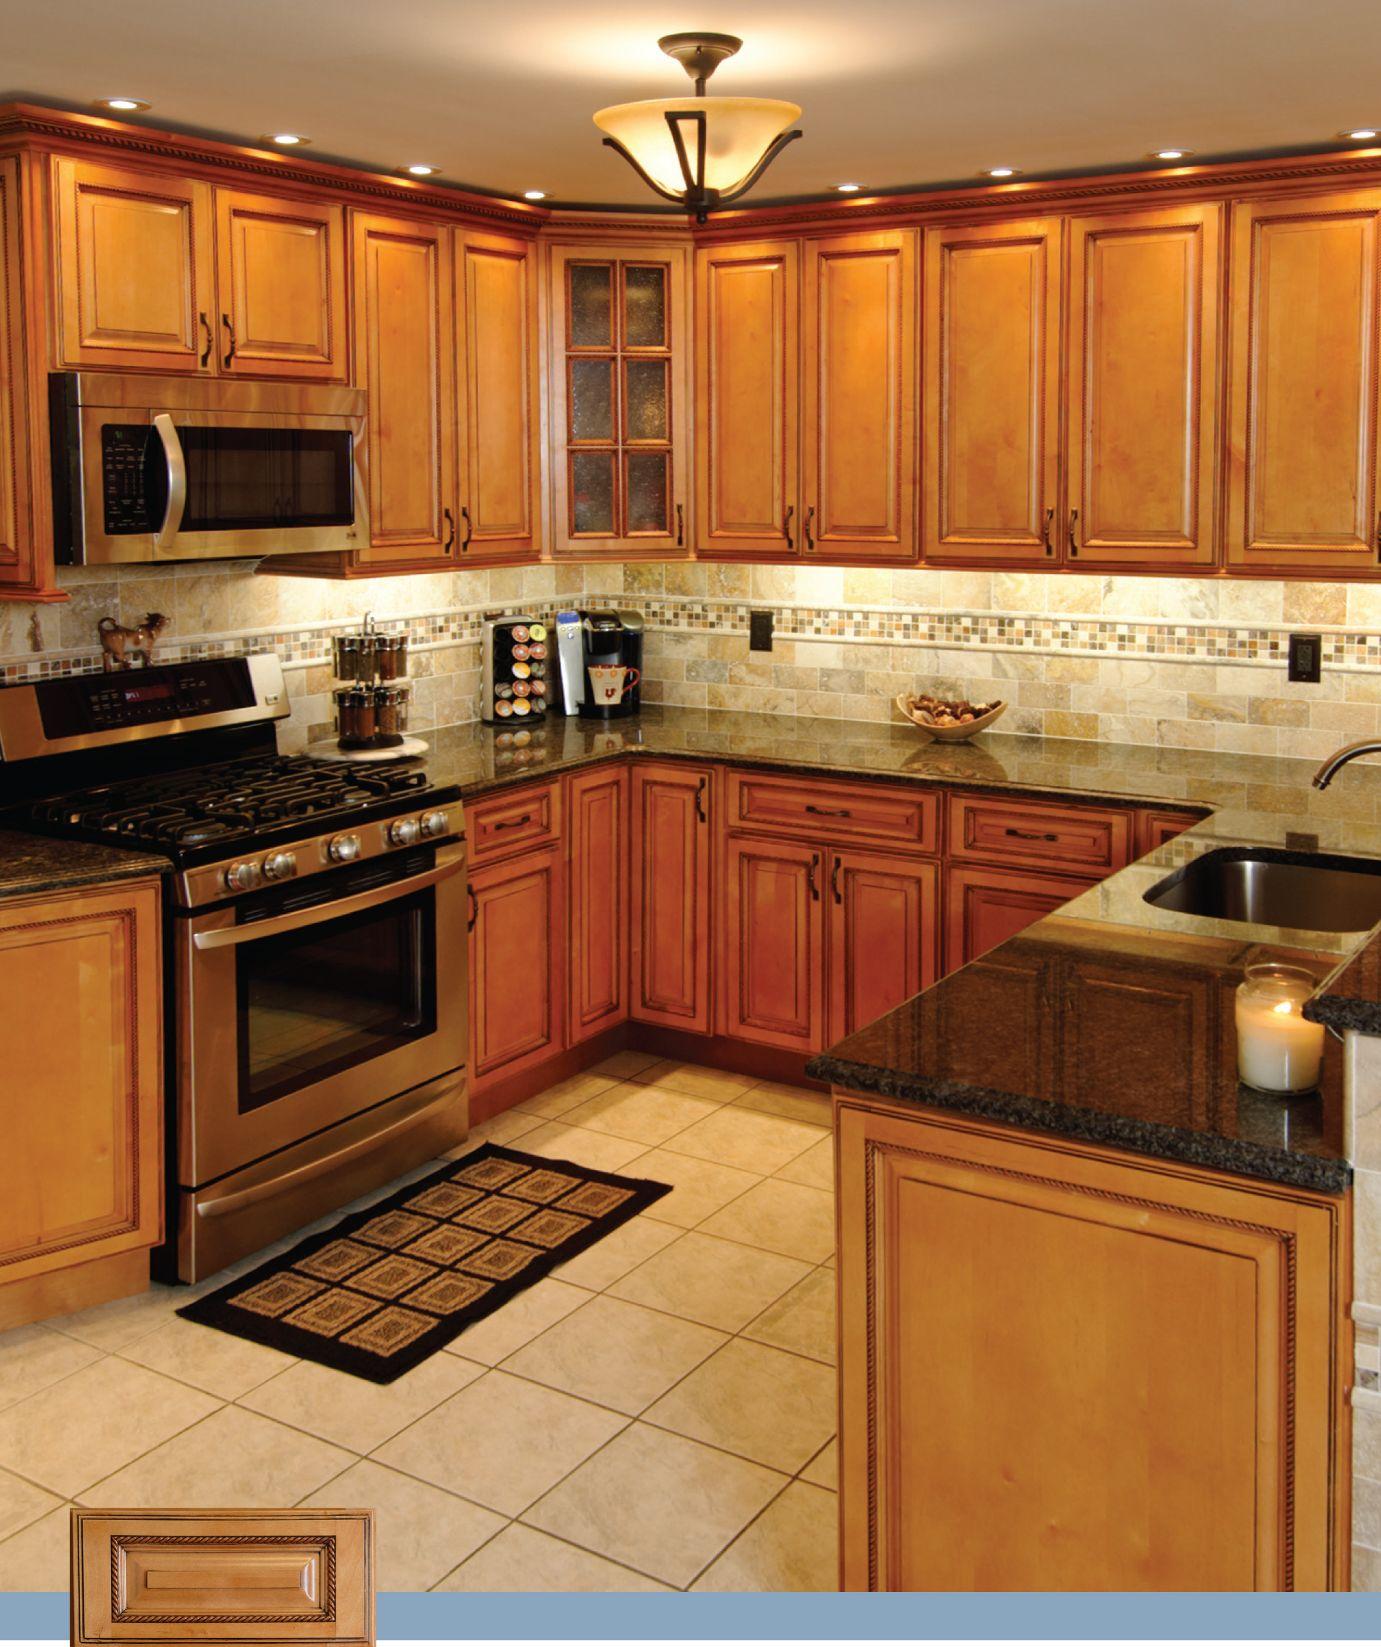 Storage pantry for kitchen Photo - 4